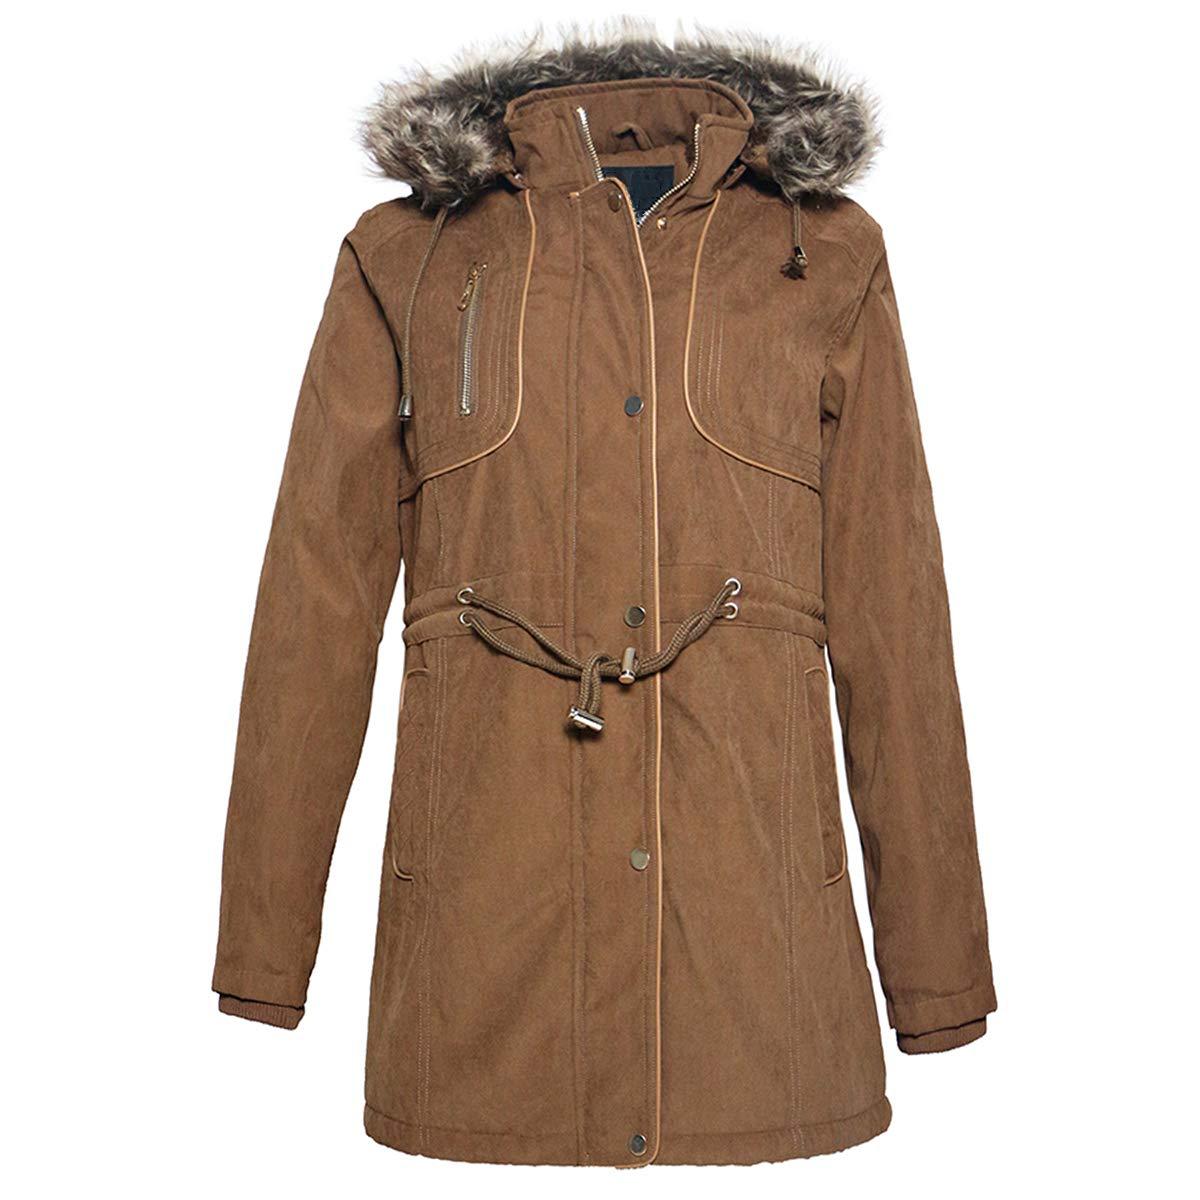 Facitisu Women/'s Parka Jacket Hoodie Winter Warm Faux Fur Anoraks Lined Drawstring Outdoor Military Coats